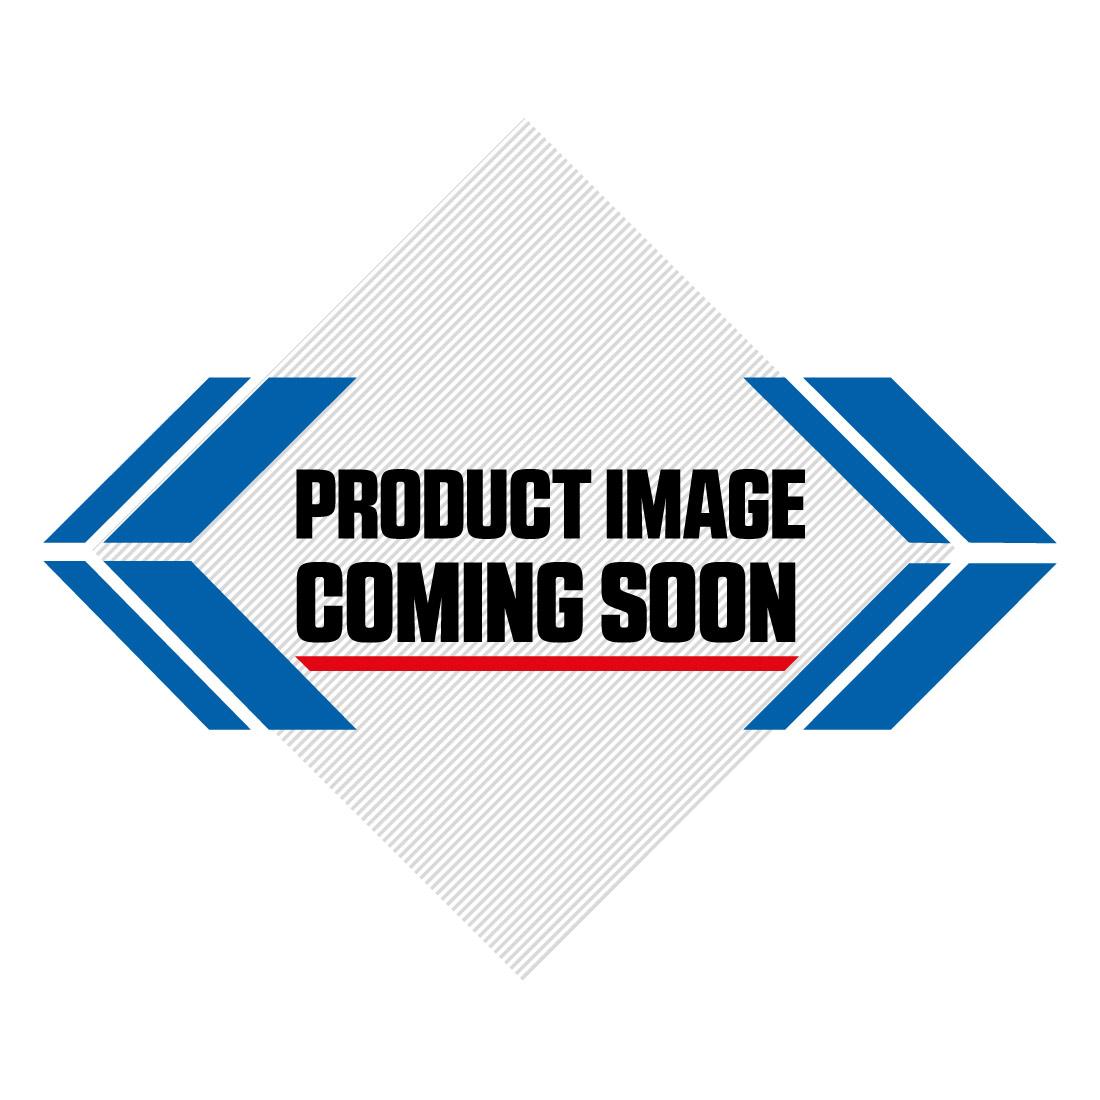 Honda Plastic Kit CRF 250 (14-17) CRF 450 (13-16) OEM Factory Image-5>